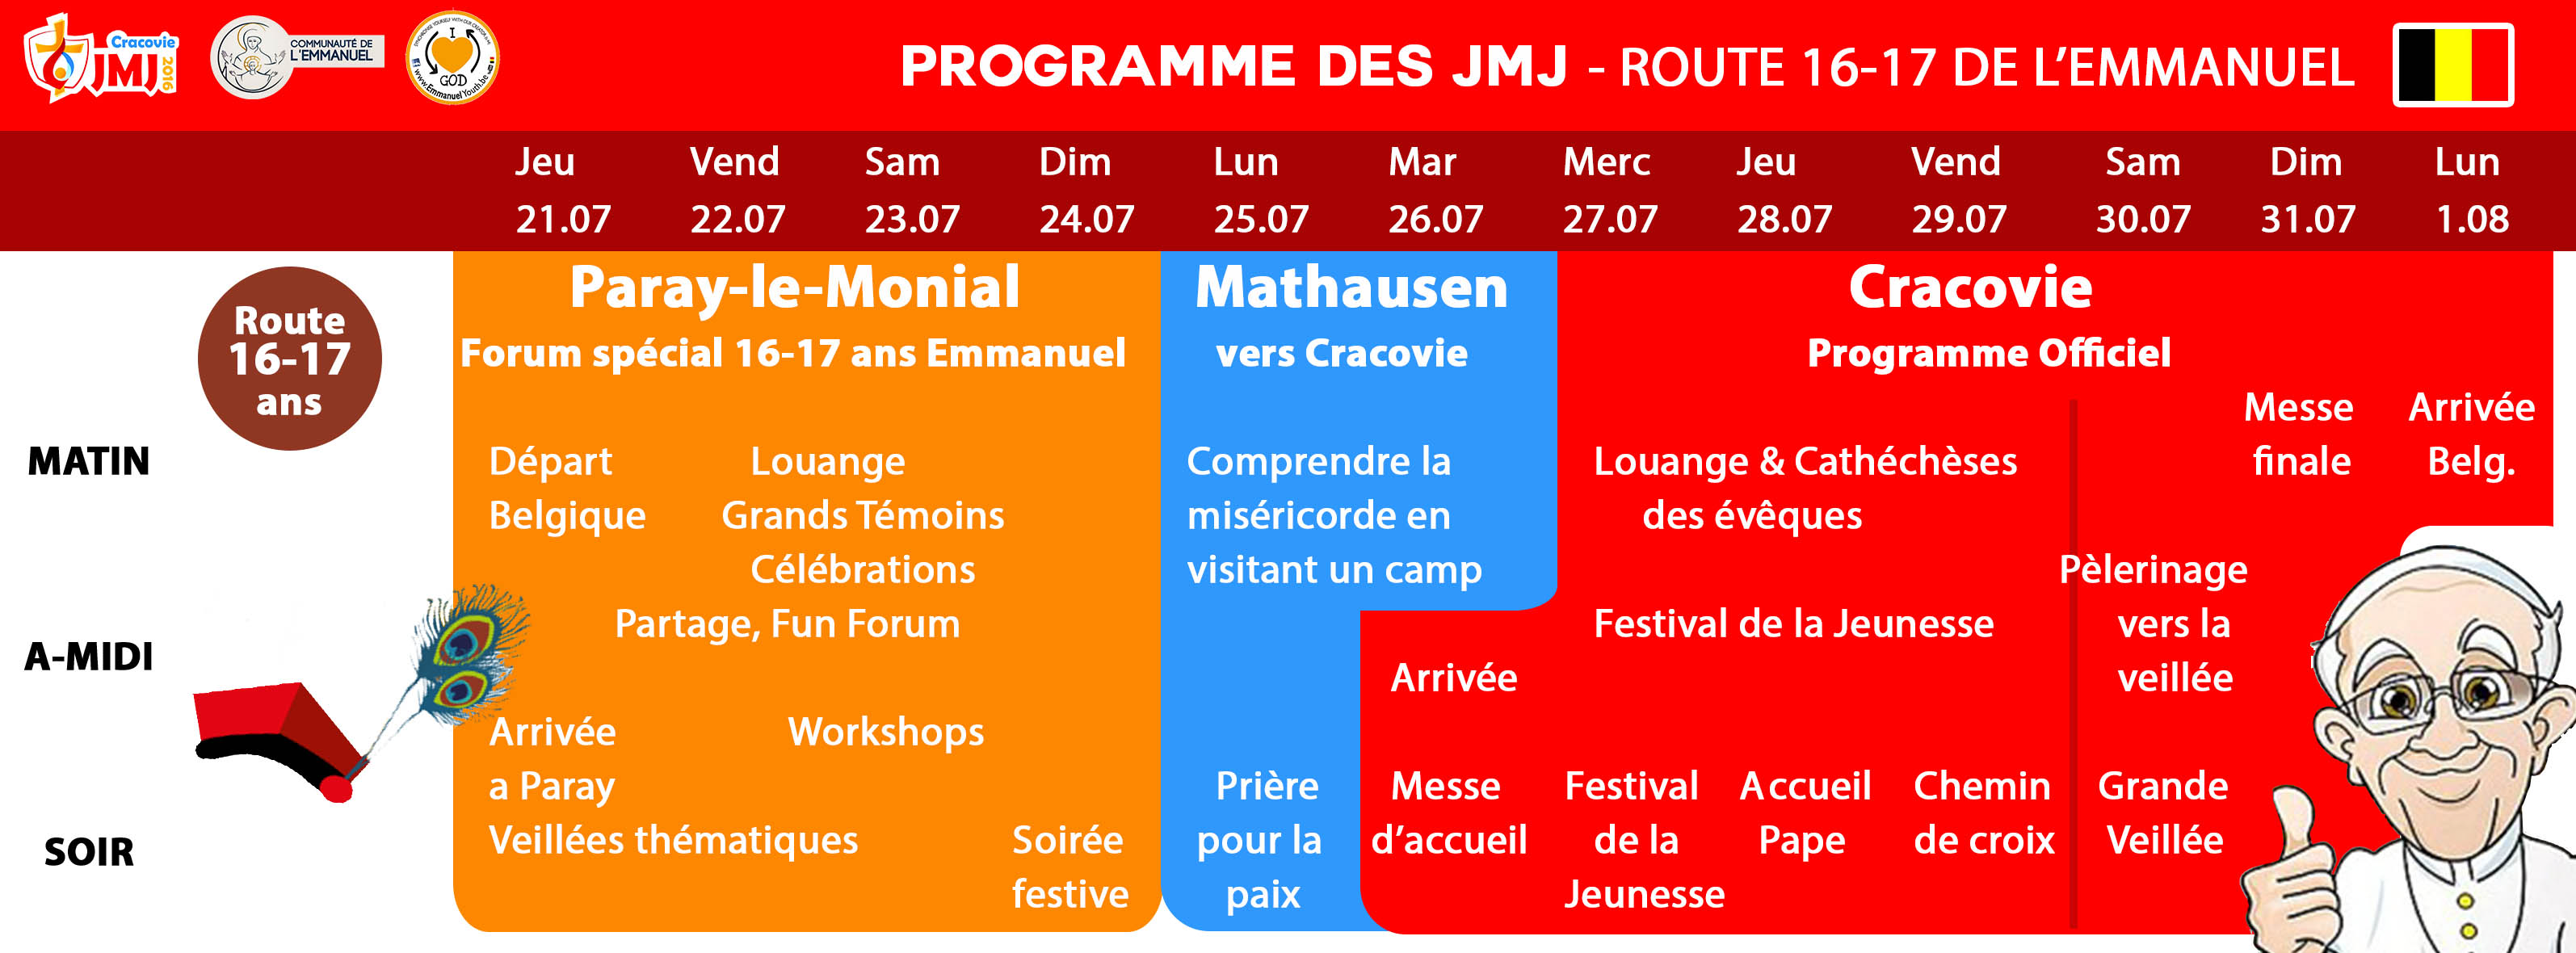 JMJ2016-ProgrammeRouteEmmanuel-16-17v4